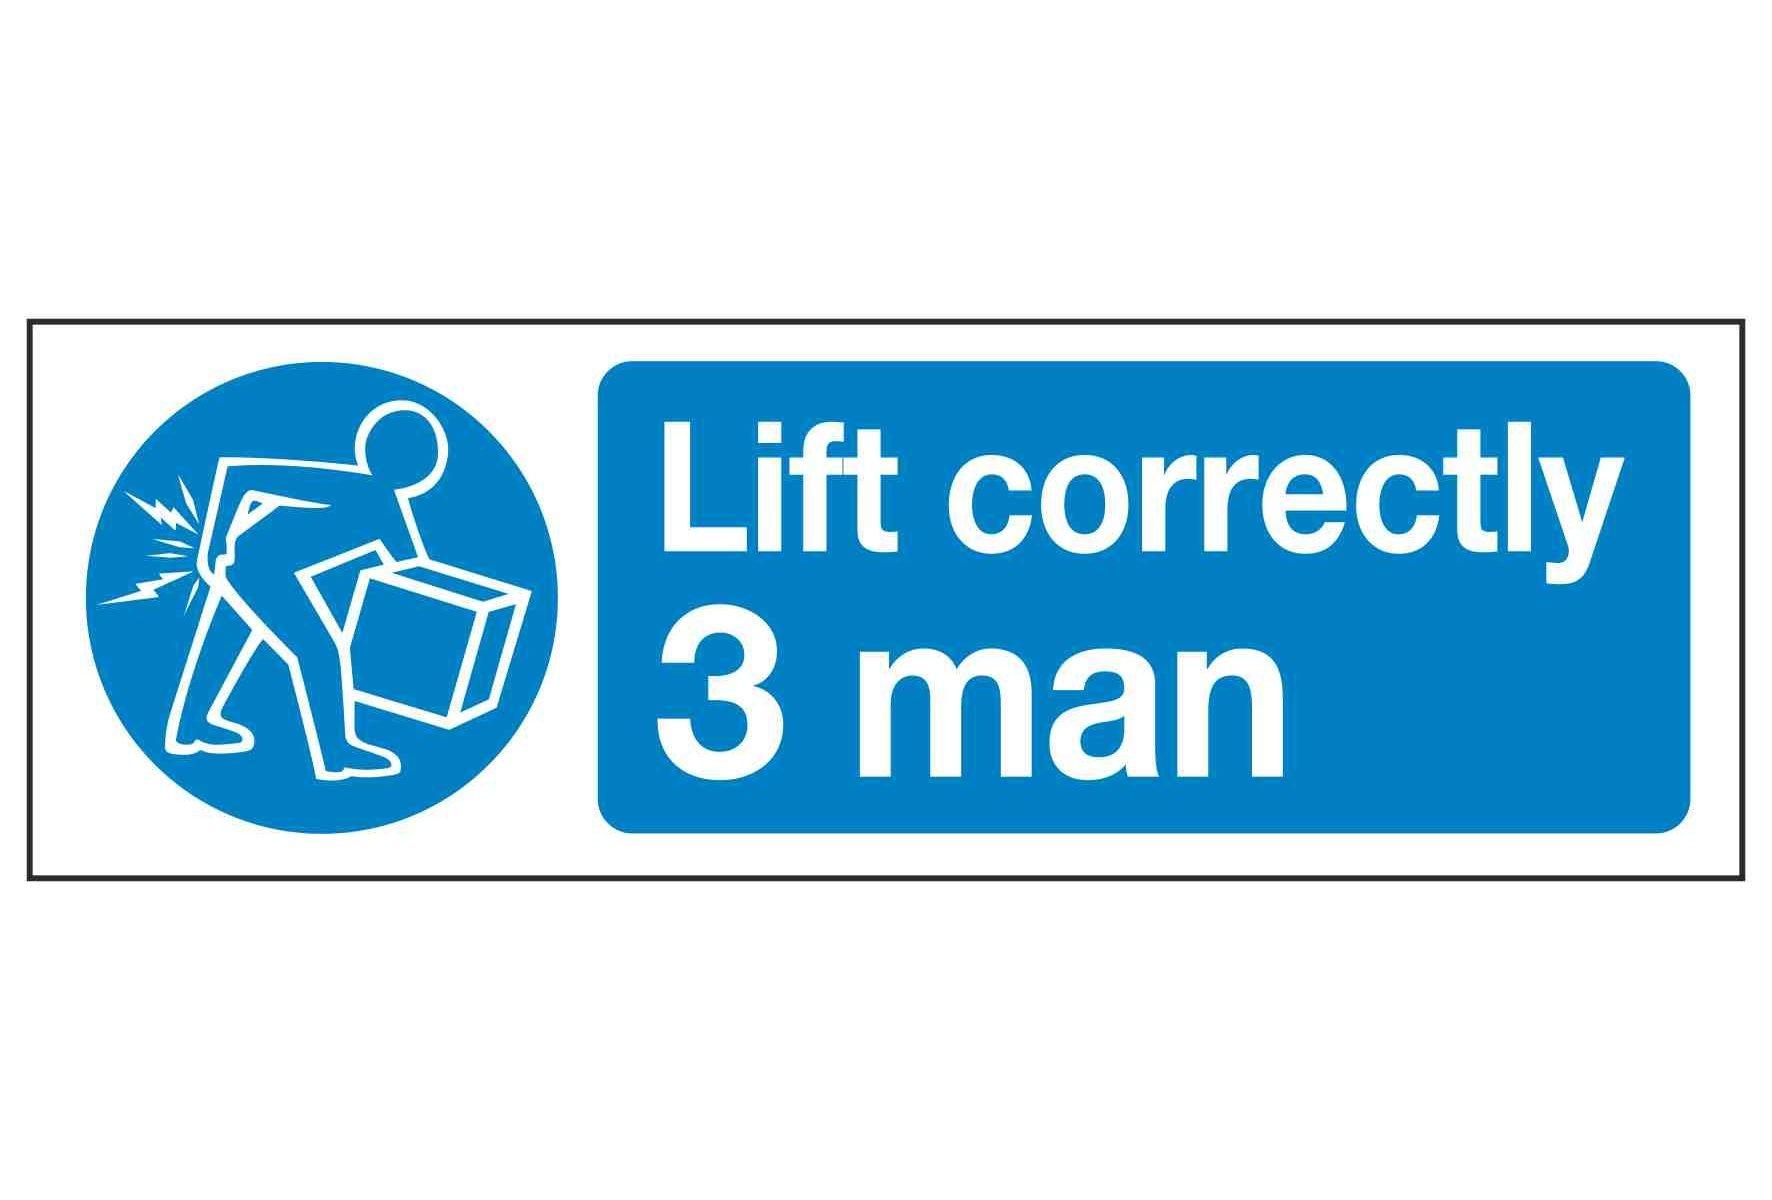 Lift correctly 3 man